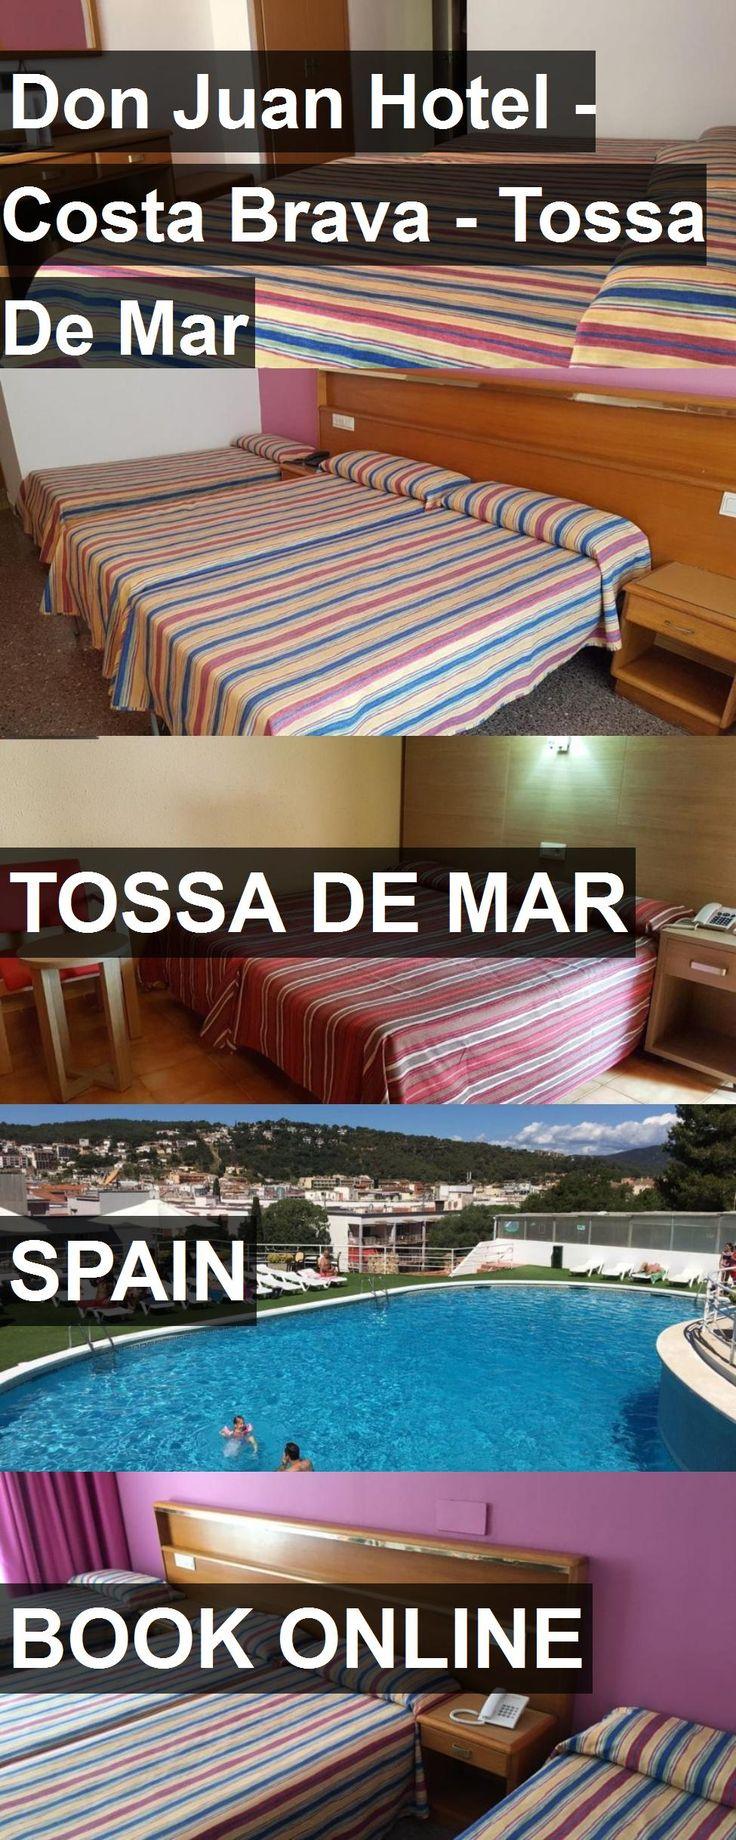 Don Juan Hotel - Costa Brava - Tossa De Mar in Tossa de Mar, Spain. For more information, photos, reviews and best prices please follow the link. #Spain #TossadeMar #travel #vacation #hotel